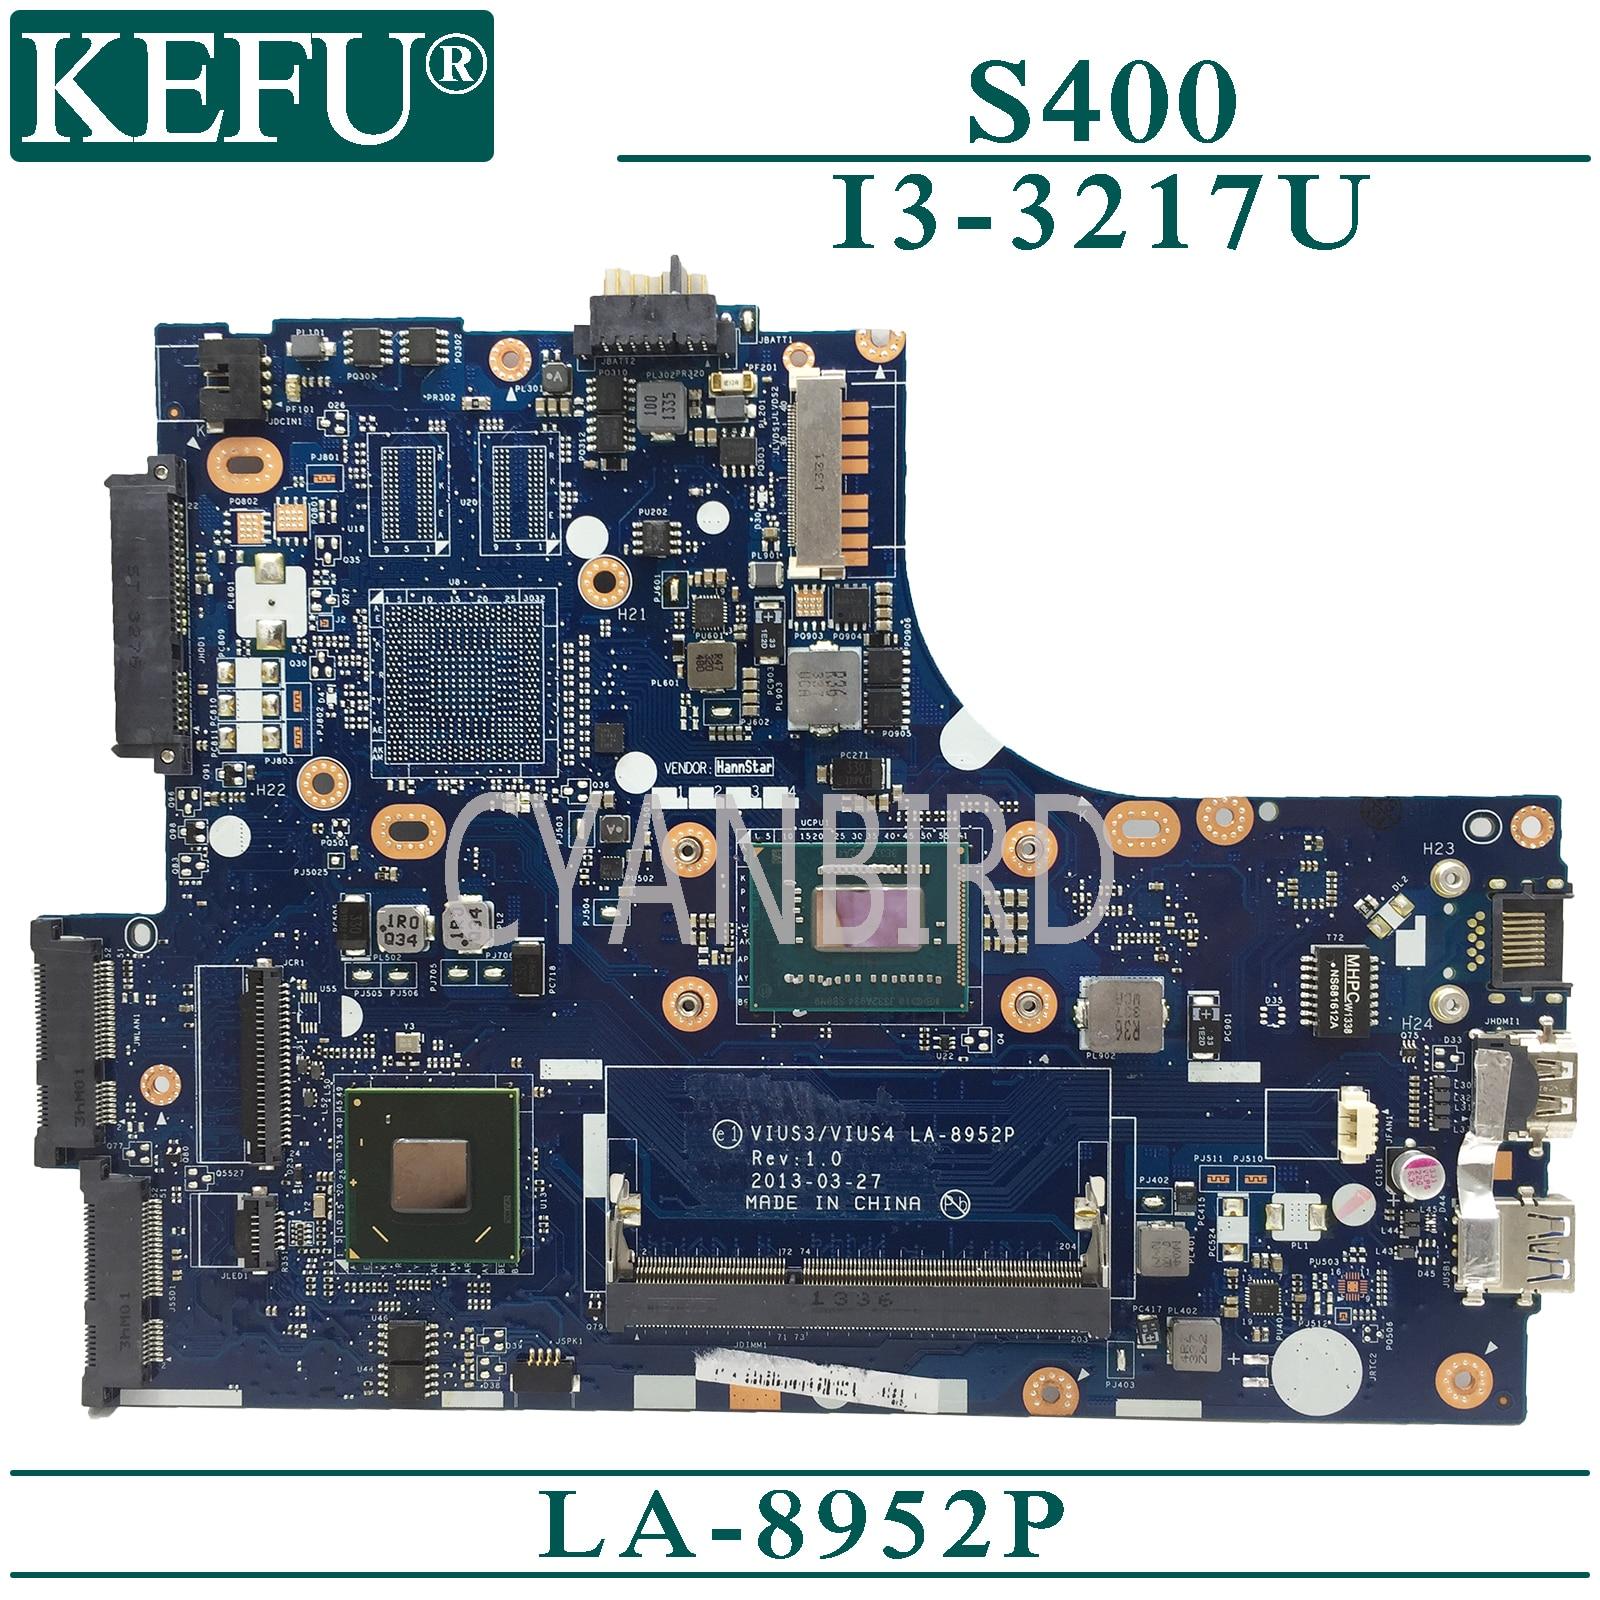 KEFU LA-8952P اللوحة الرئيسية الأصلية لينوفو S400 مع اللوحة الأم للكمبيوتر المحمول I3-3217U